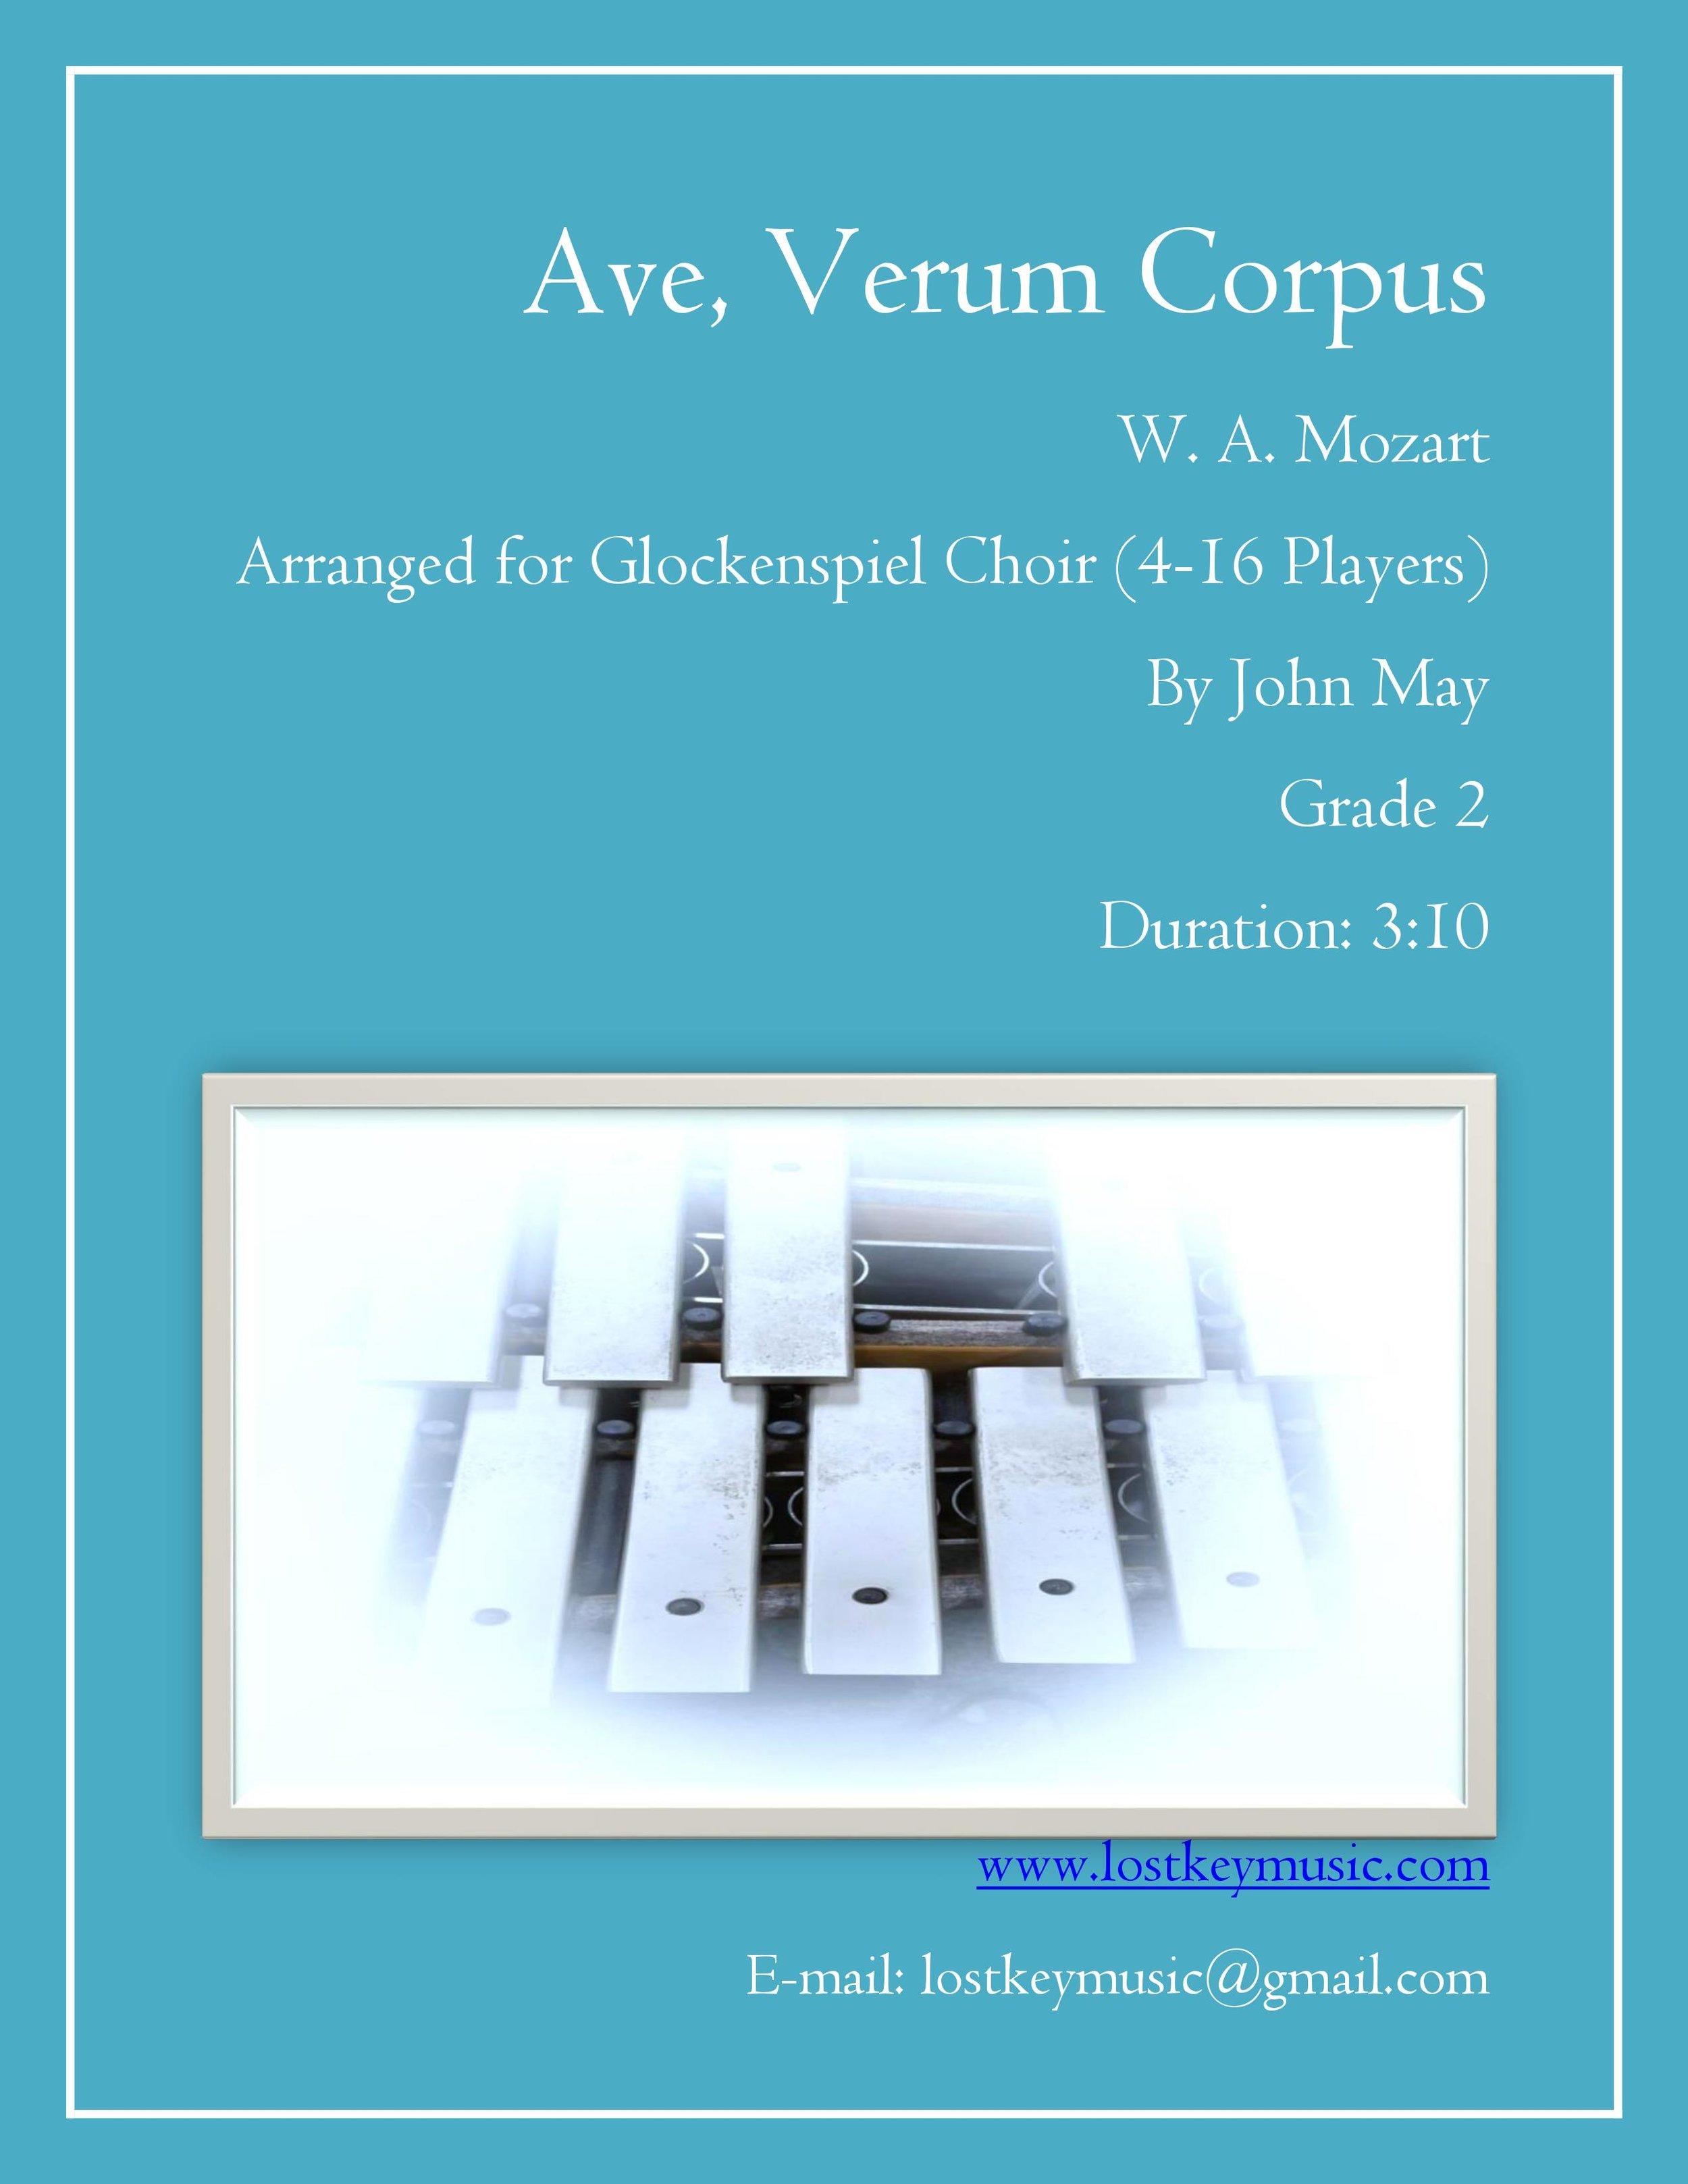 Ave, Verum Corpus Cover Photo.jpg